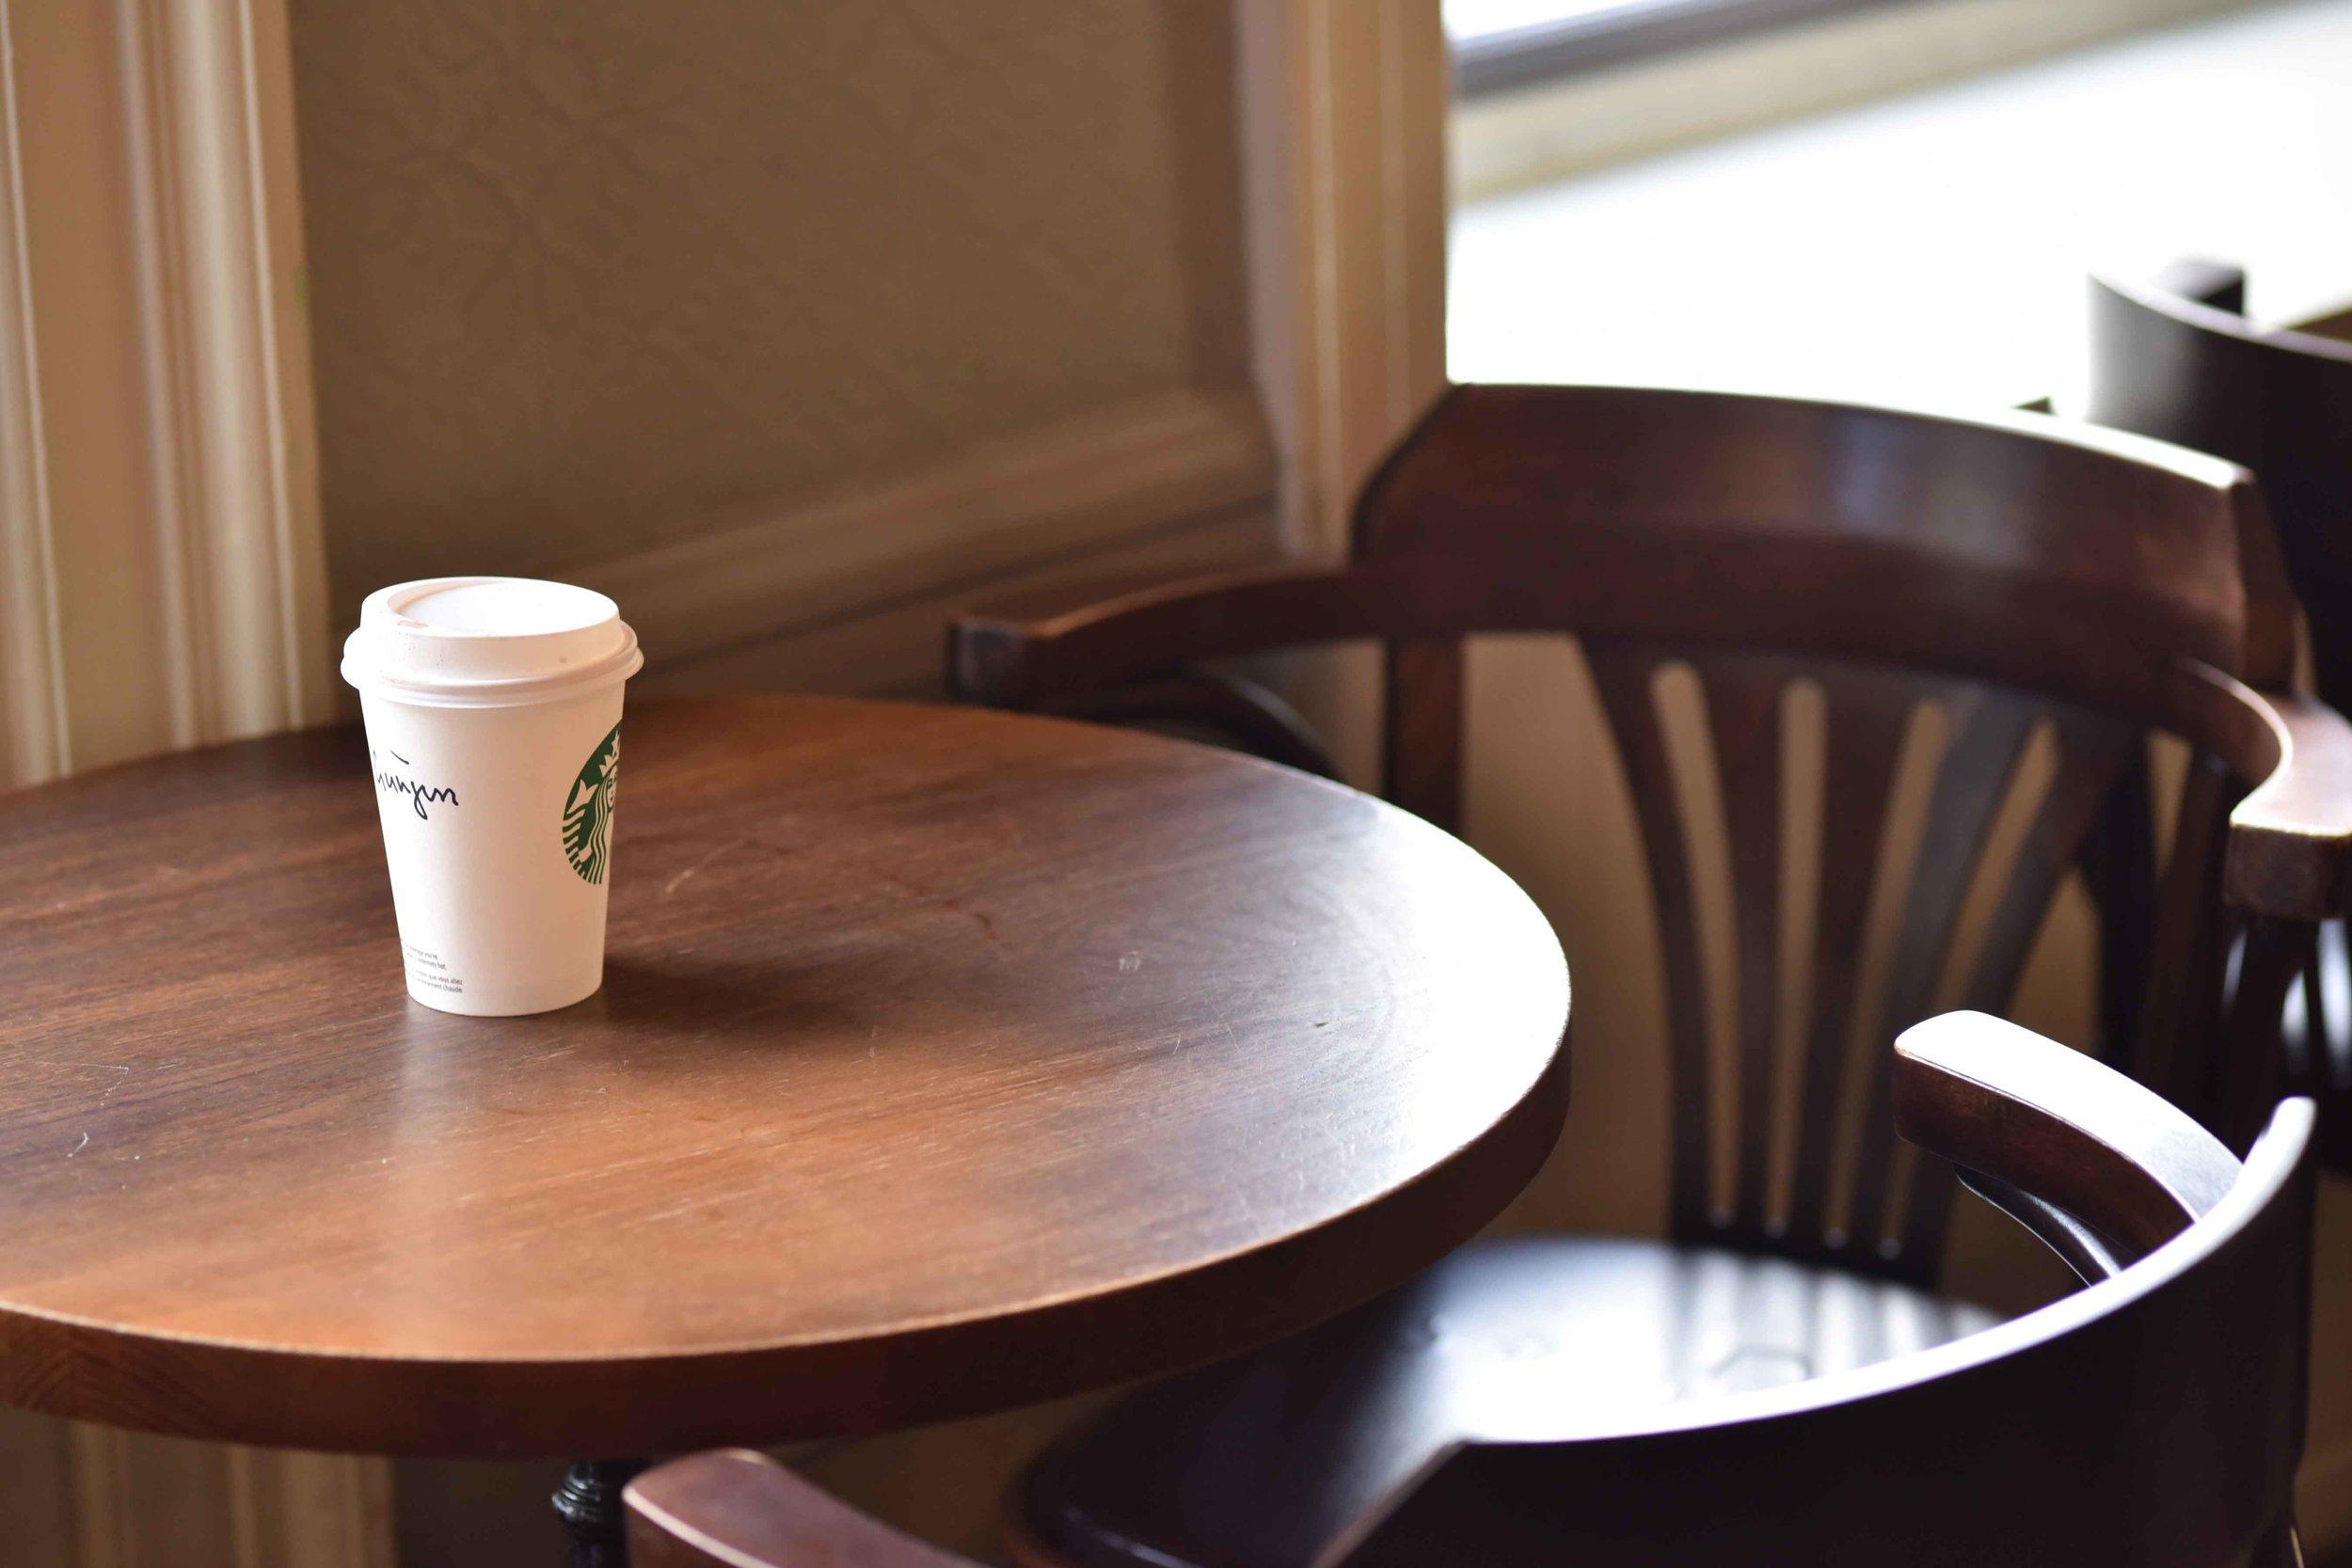 Starbucks, Royal Mile, Old Town, Edinburgh, Scotland. Image©thingstodot.com